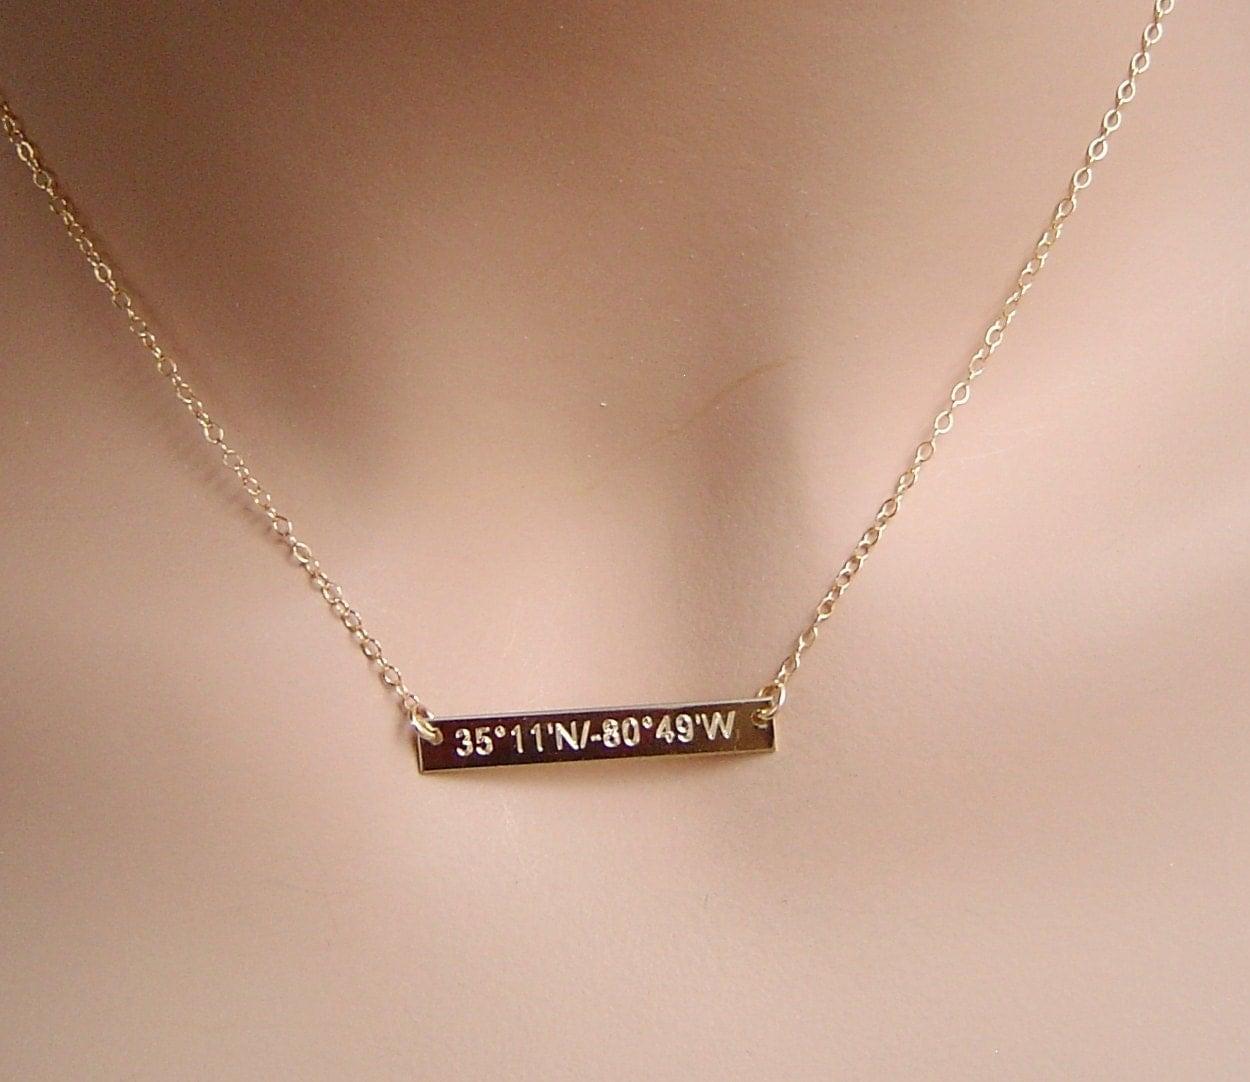 big sale personalized gold bar necklace by personalanddesign. Black Bedroom Furniture Sets. Home Design Ideas